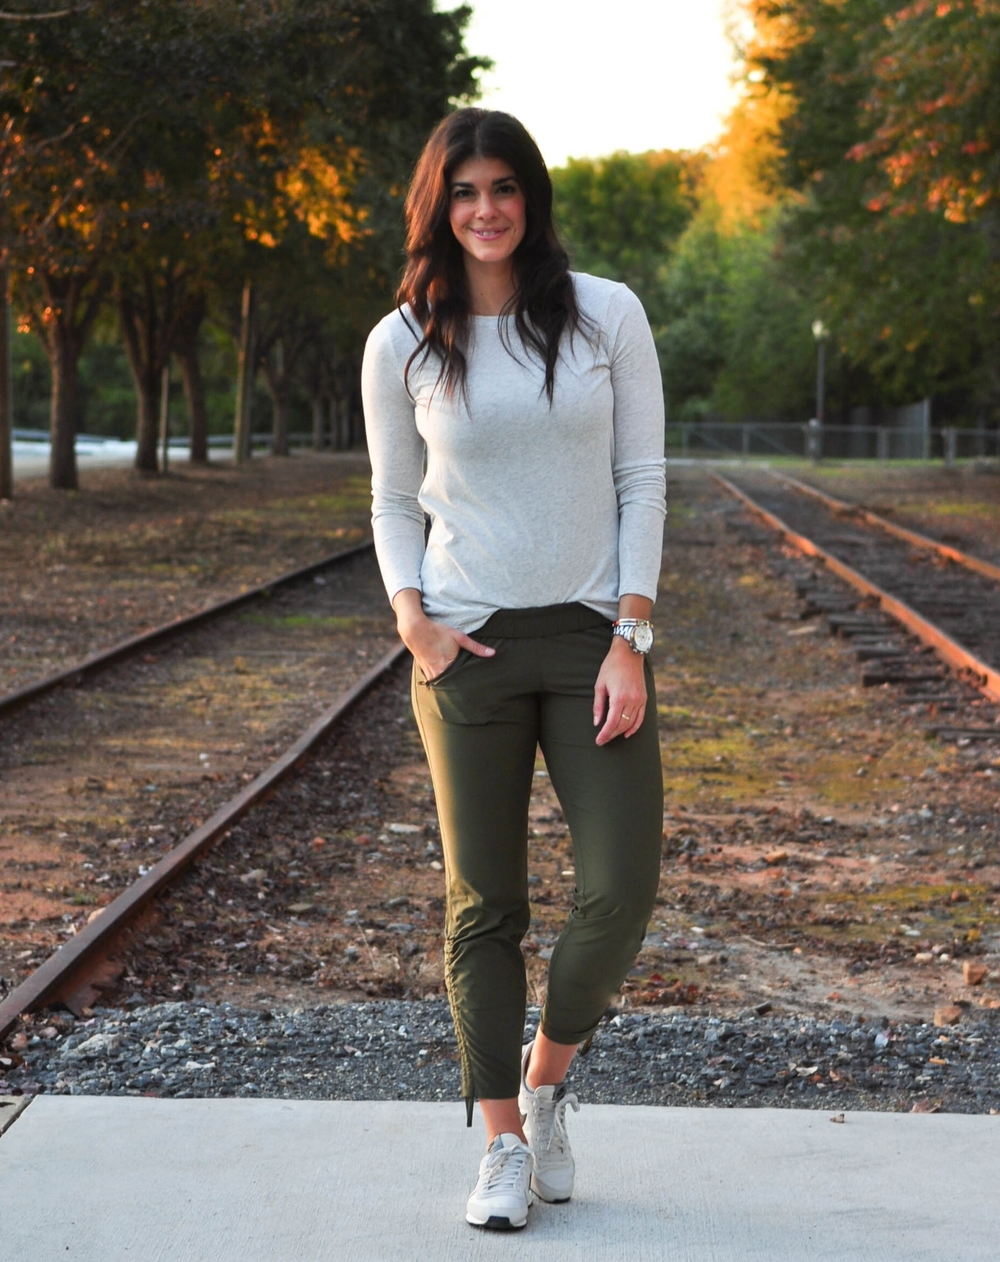 LaurenSchwaiger-Active-Life-Style-Blog-Athleta-Fall-Athleisure-Wear.jpg